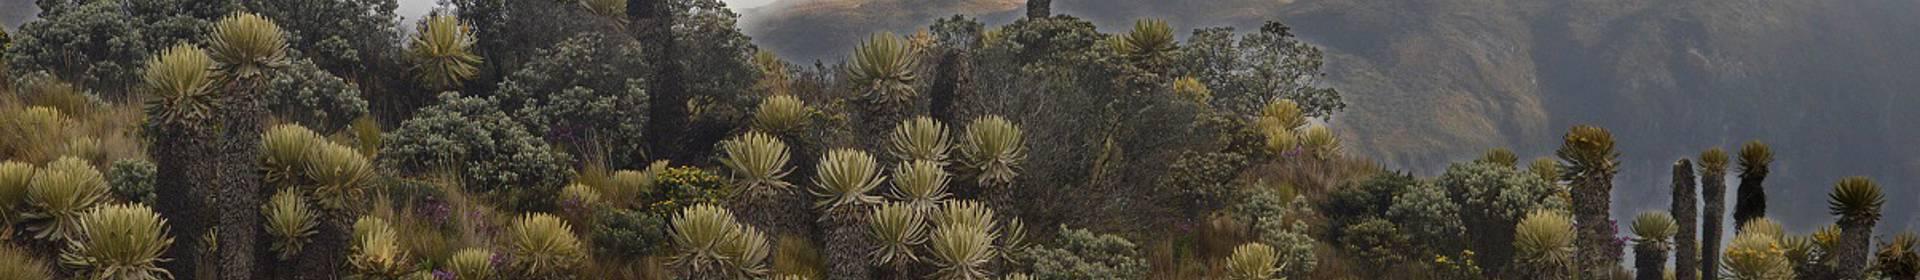 Parc national naturel de Los Nevados